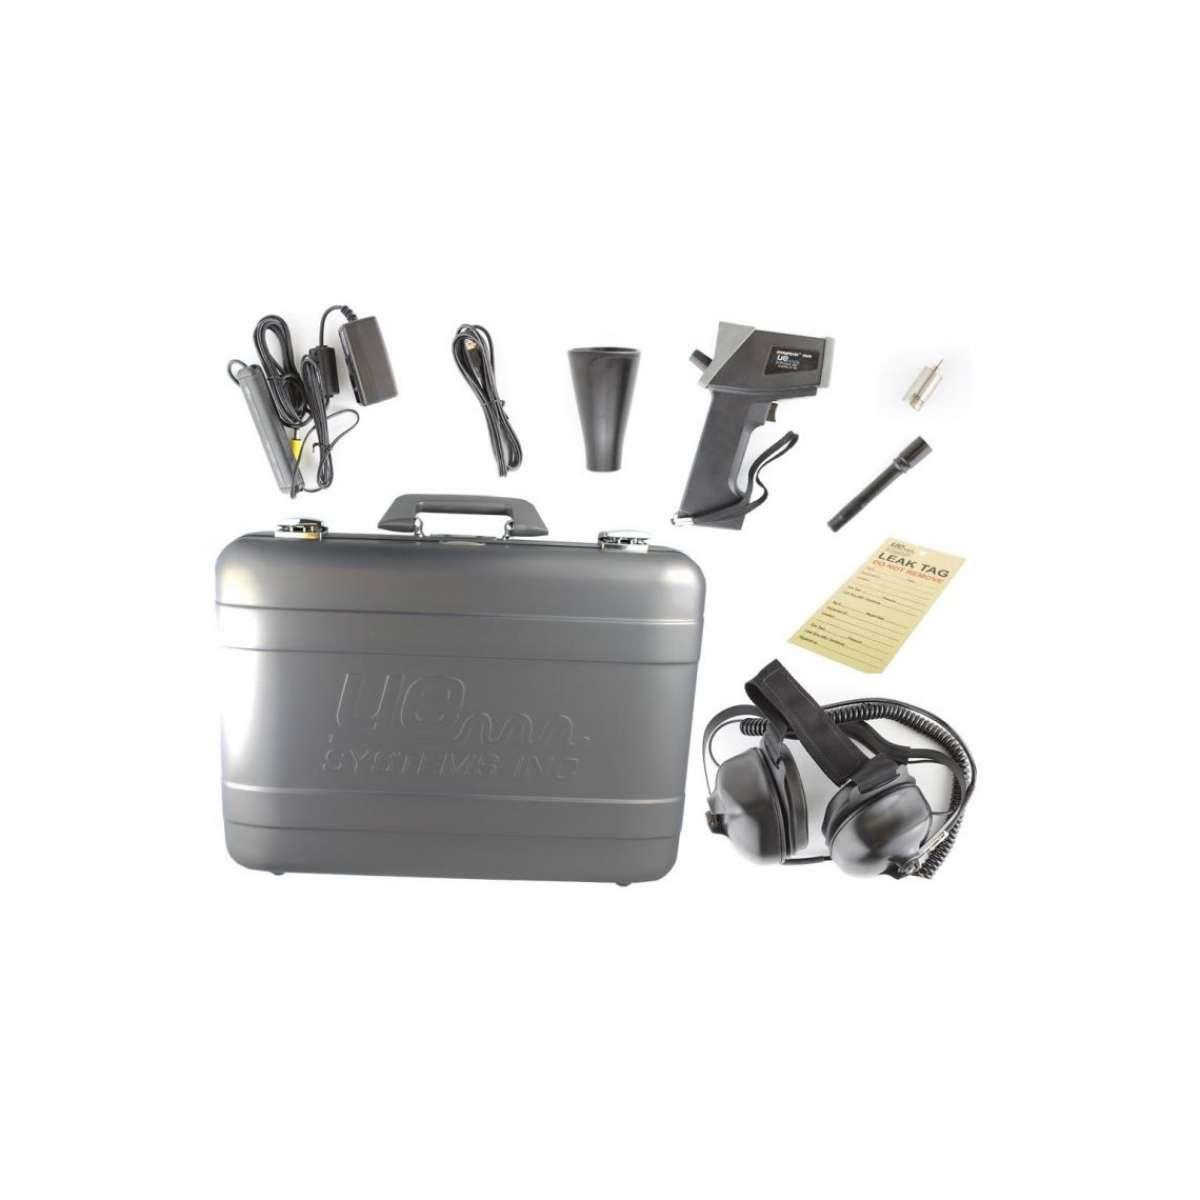 Ultraprobe 3000 portable